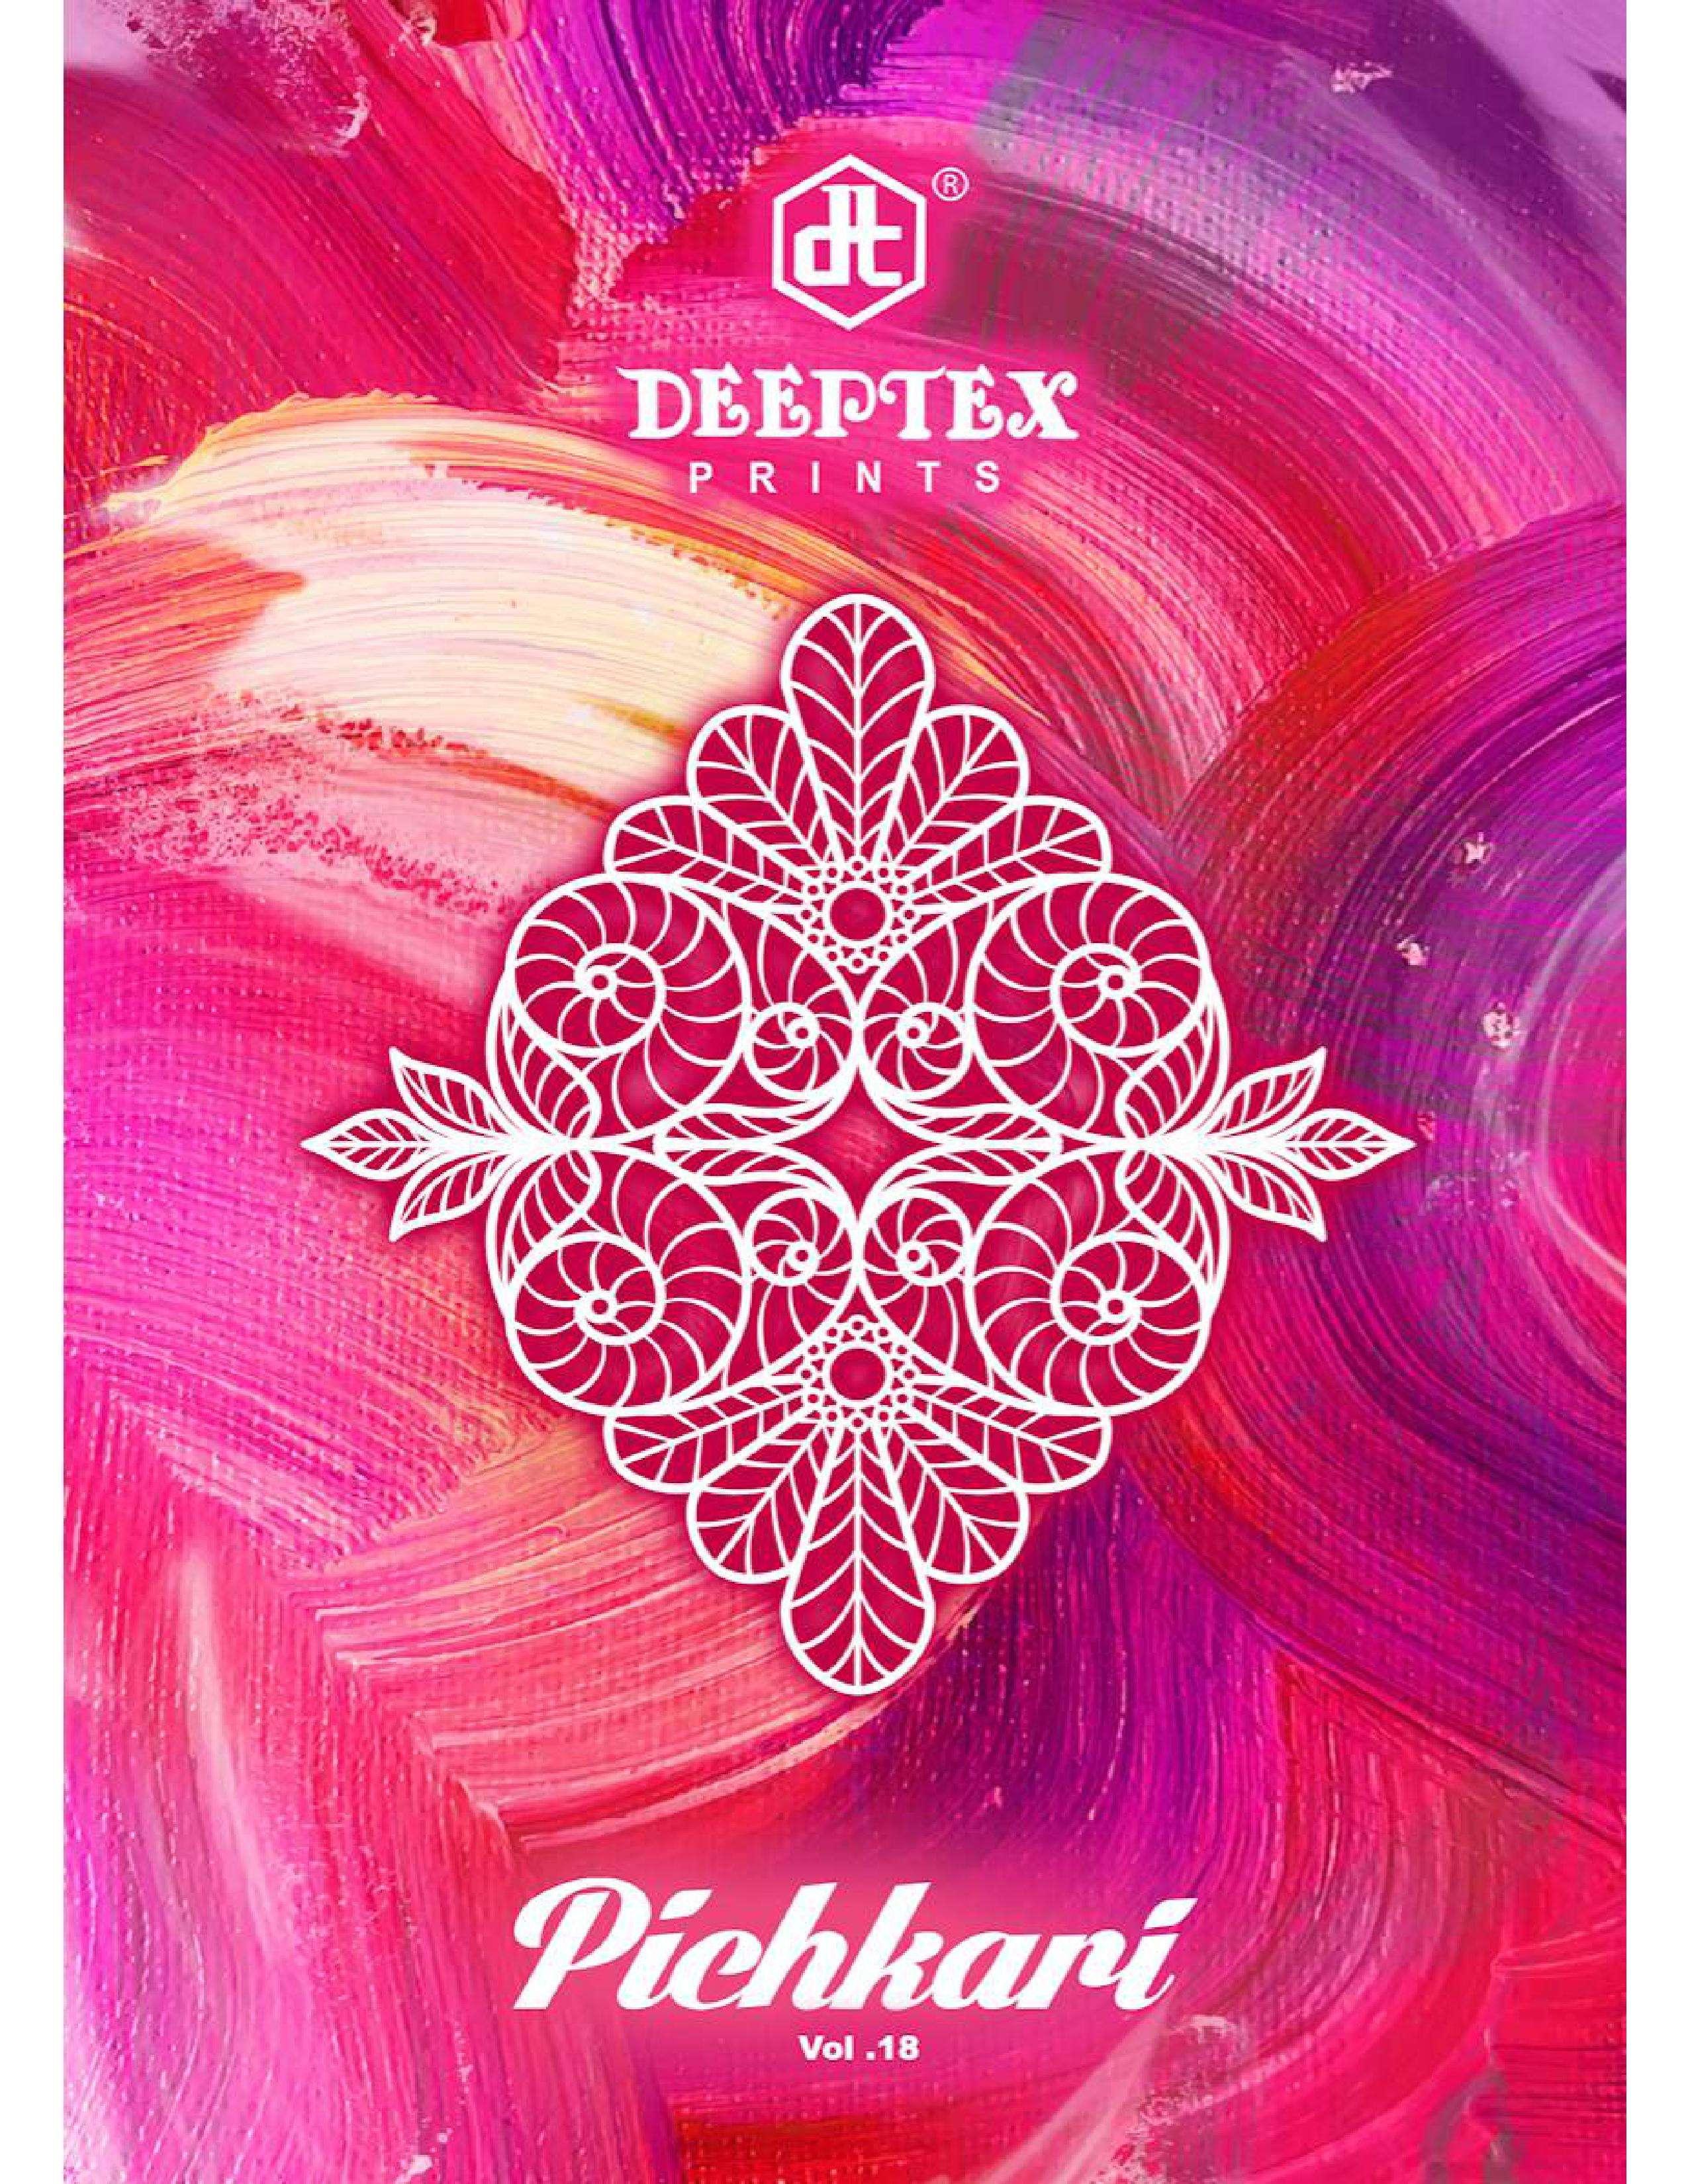 DEEPTEX PRINTS PICHKARI VOL 18 COTTON PRINTED DRESS MATERIAL COLLECTION